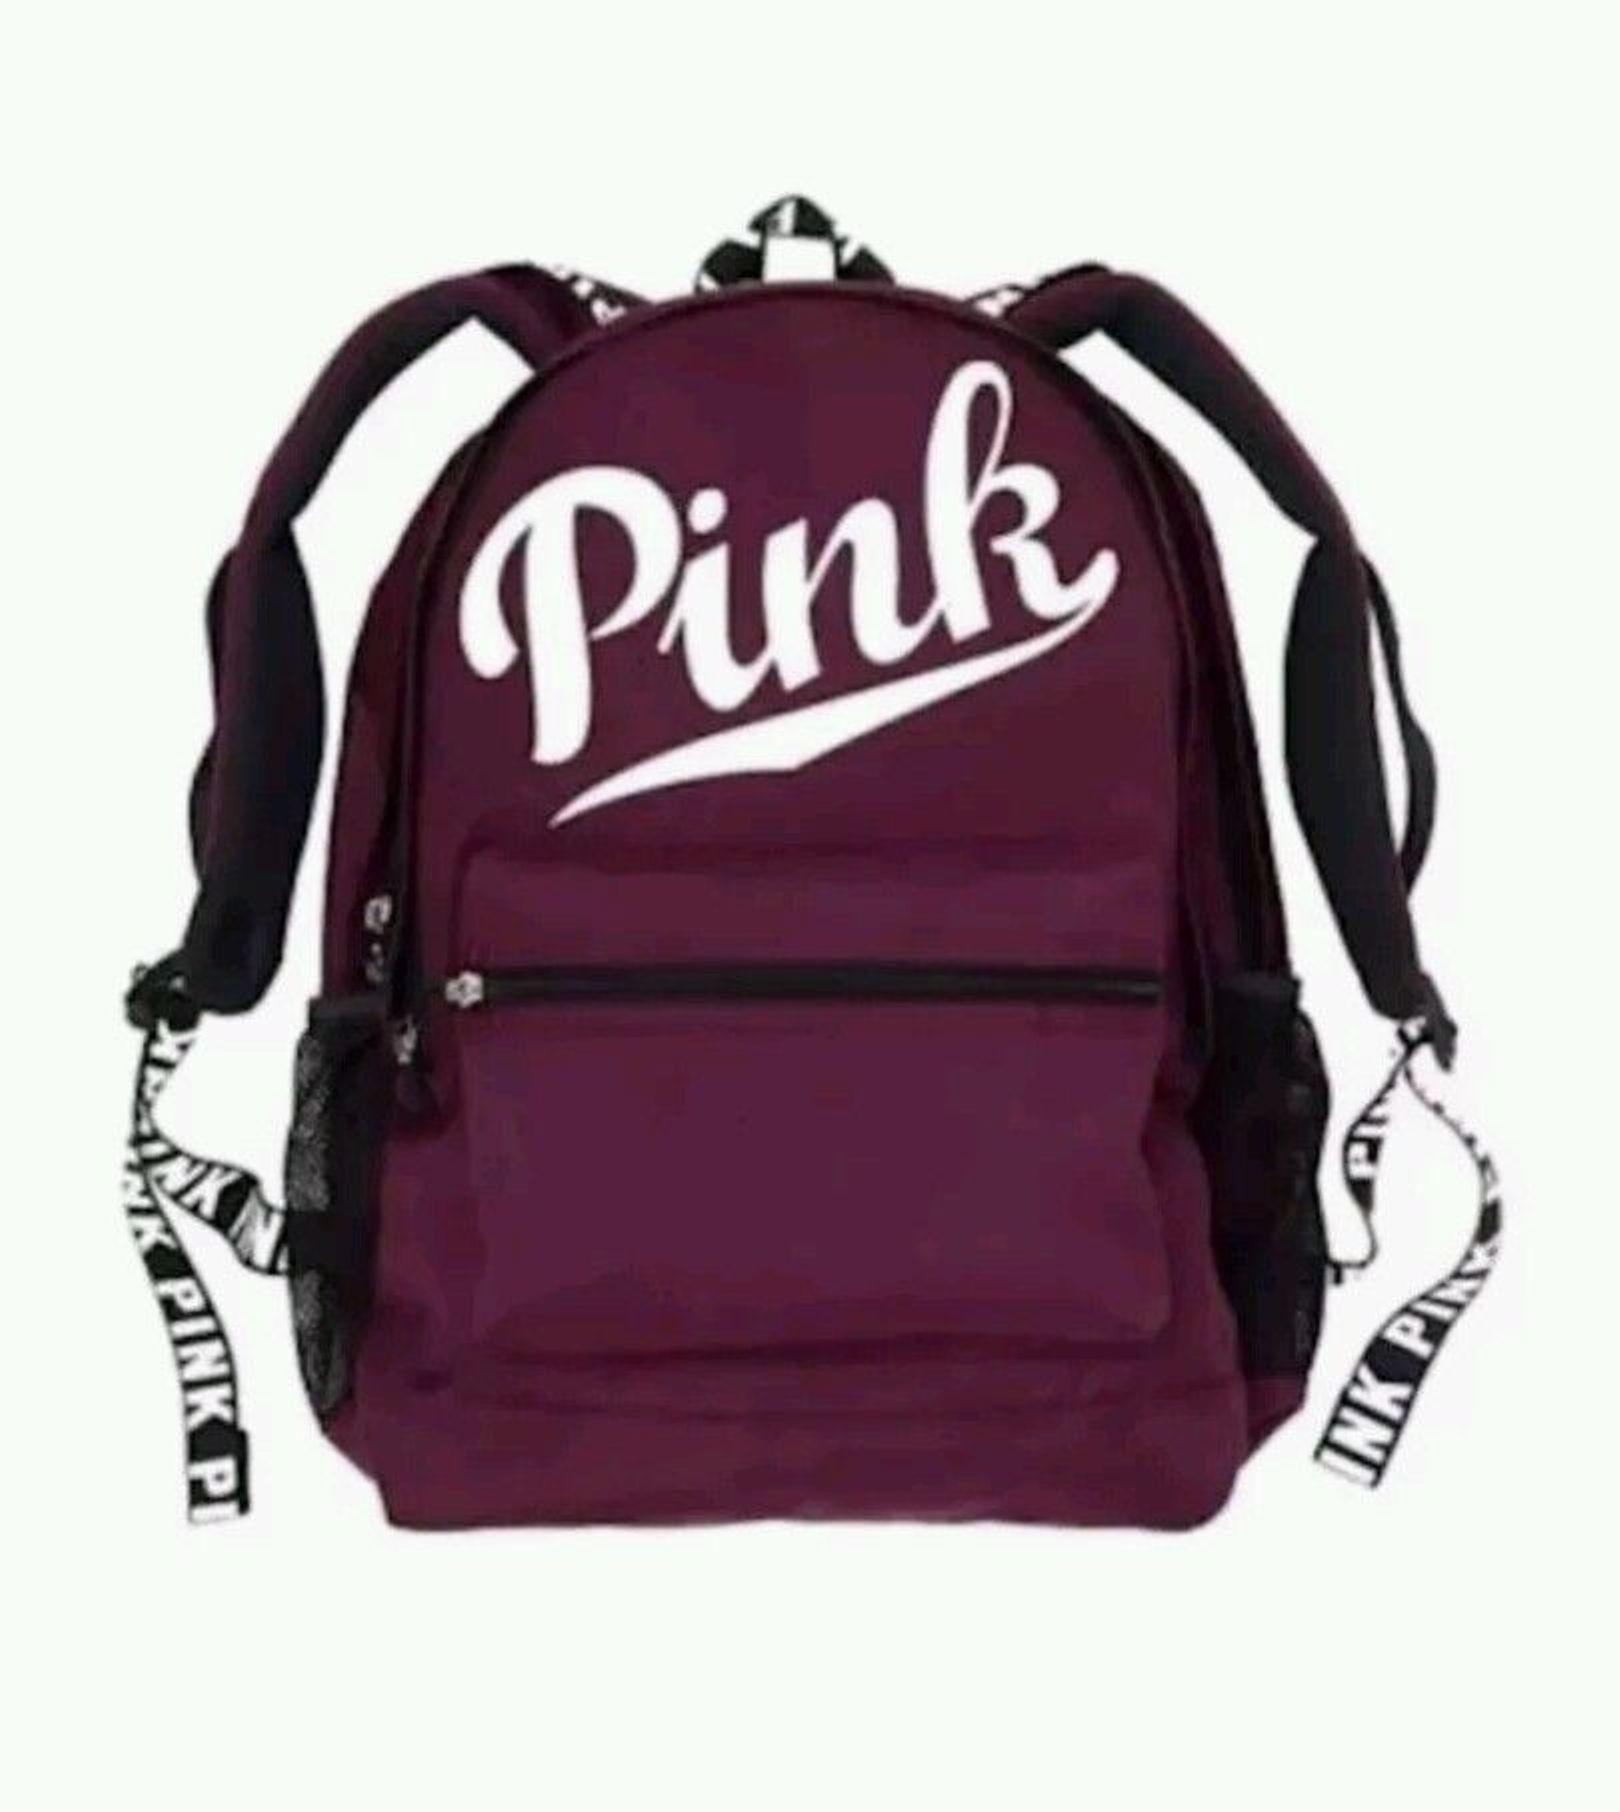 7f37507a5c0f Victoria Secret Pink Backpack Ebay- Fenix Toulouse Handball